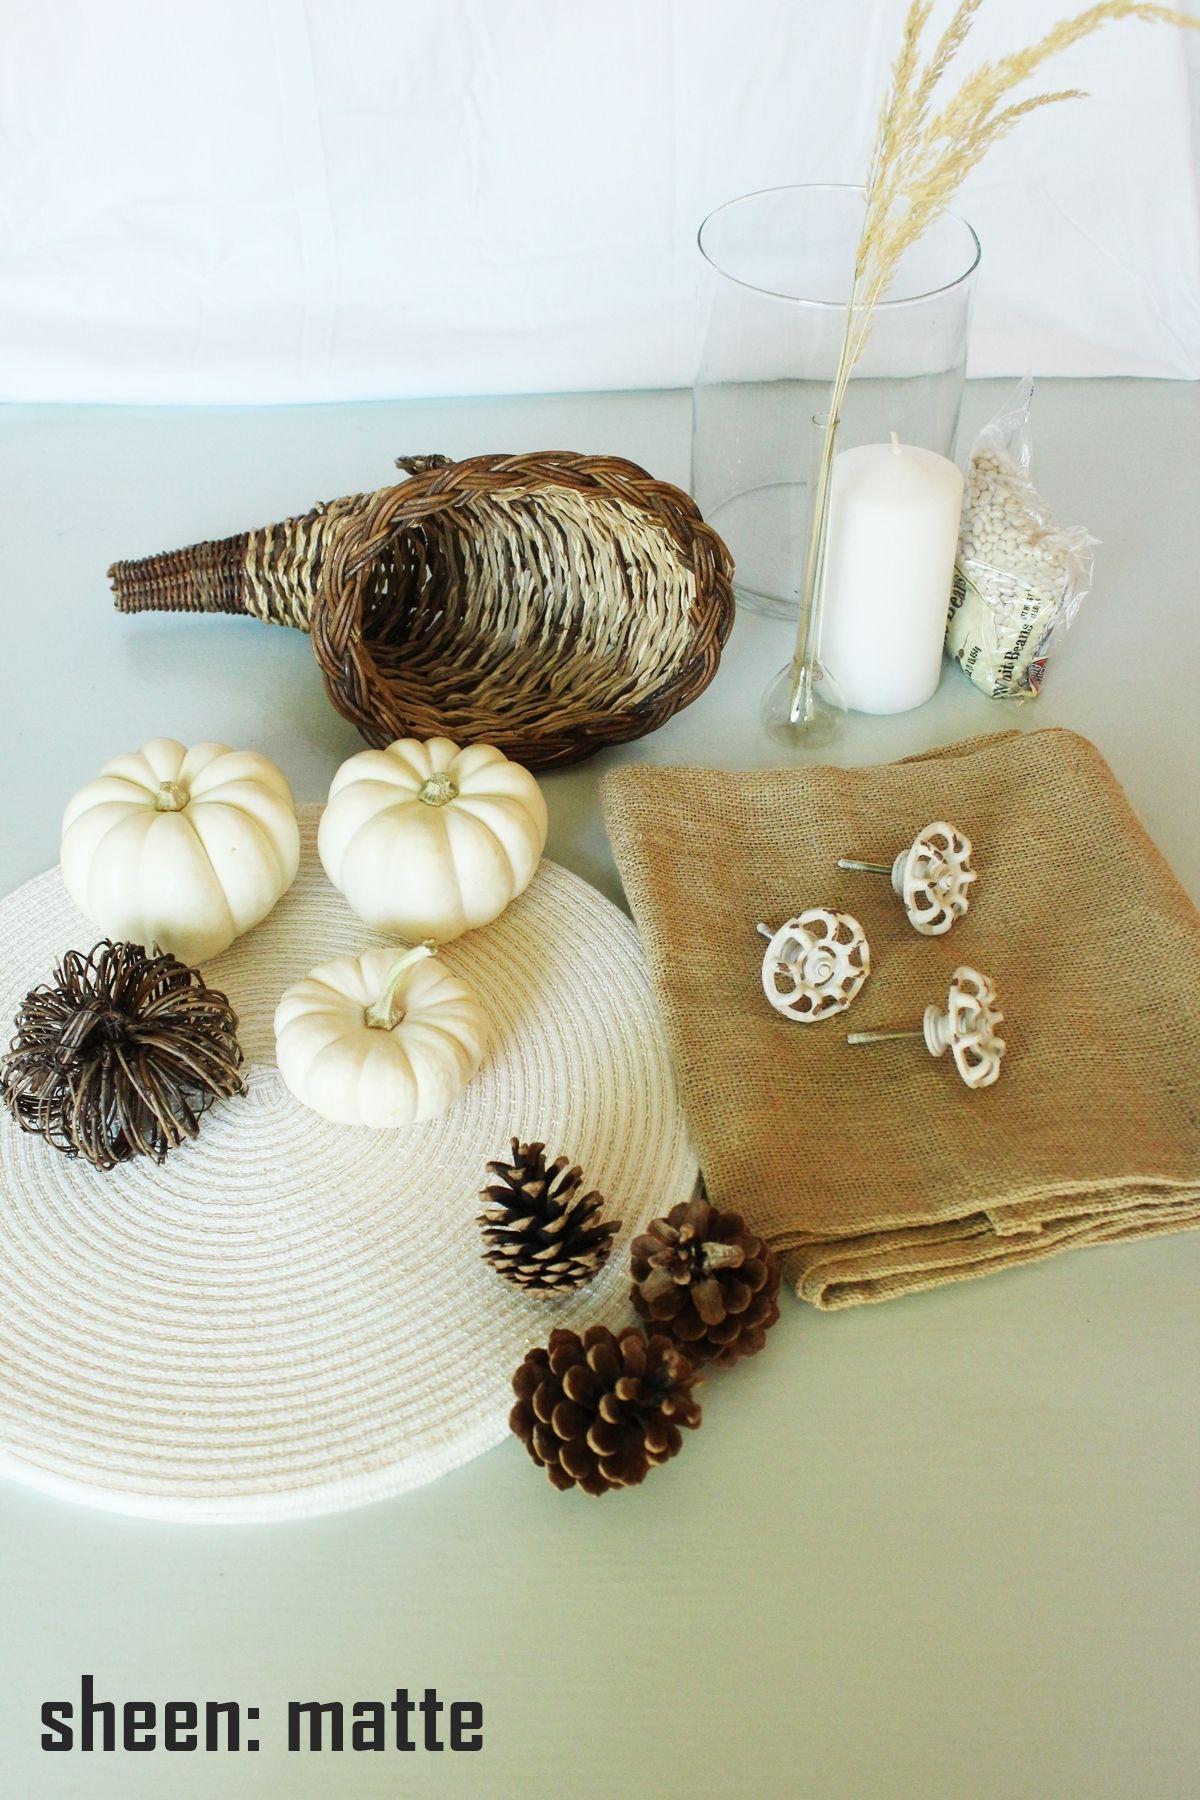 White Pumpkin Centerpieces - texture and nature